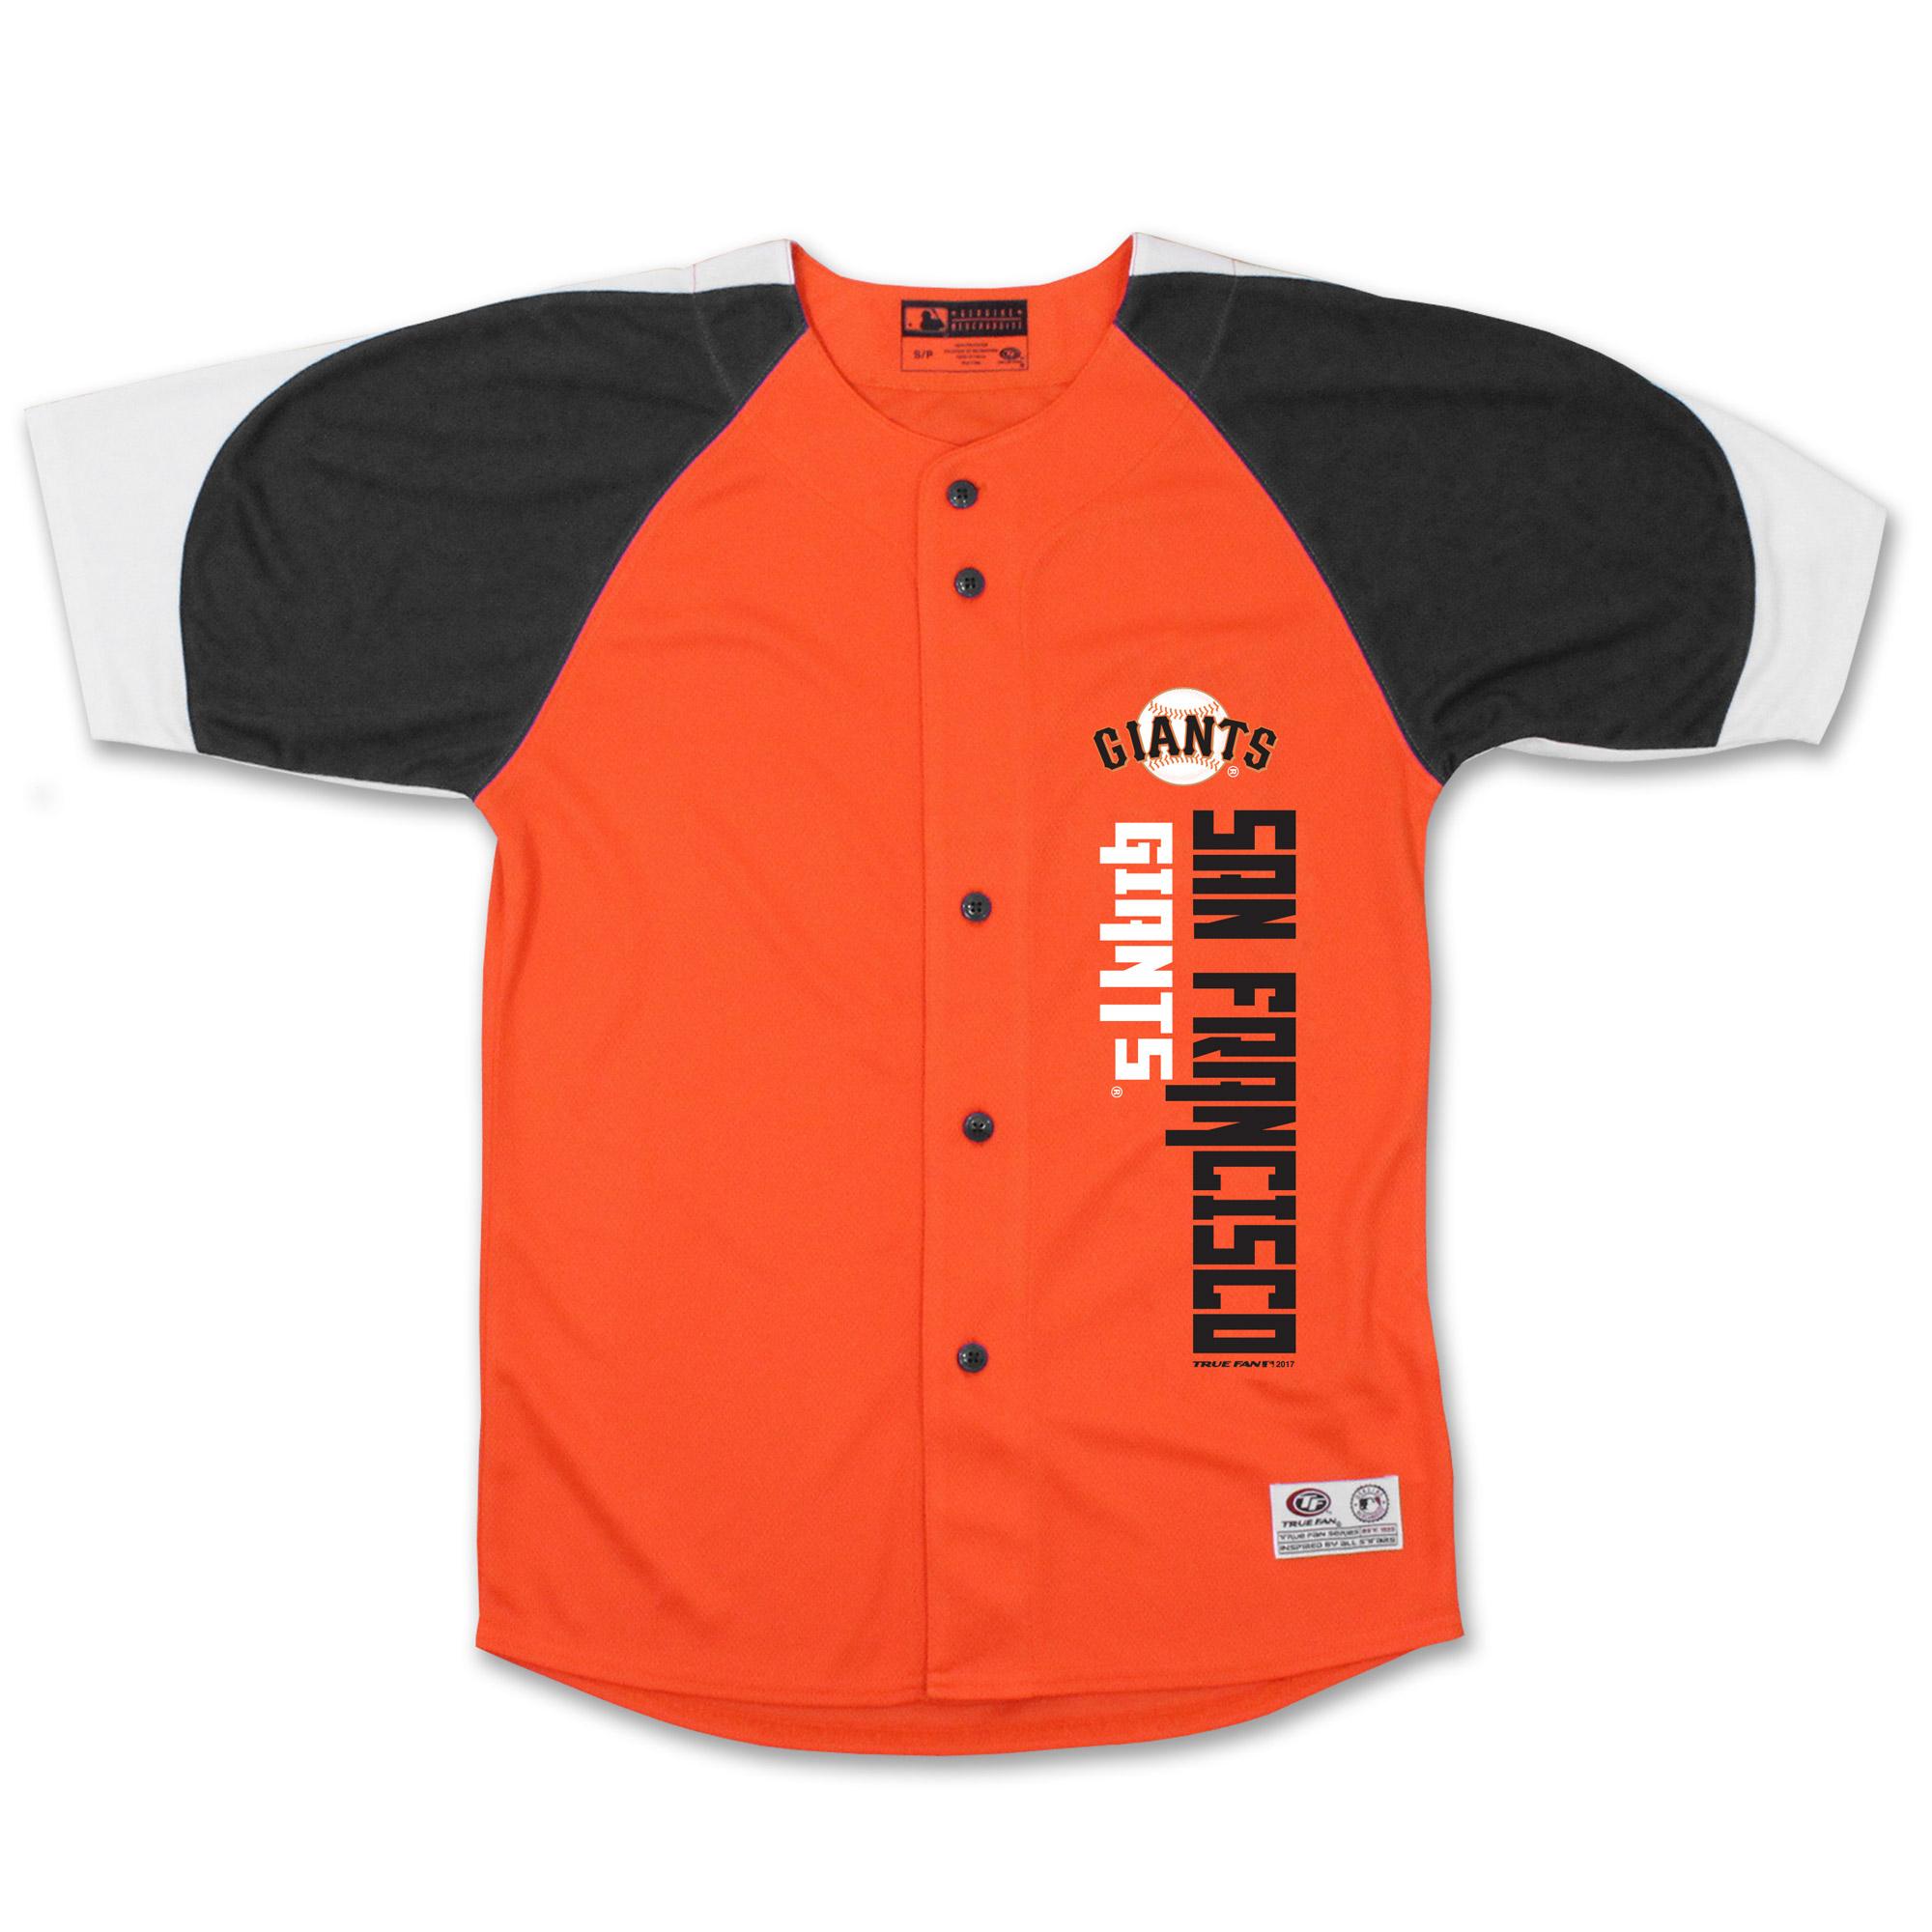 San Francisco Giants Stitches Youth Vertical Jersey - Orange/Black